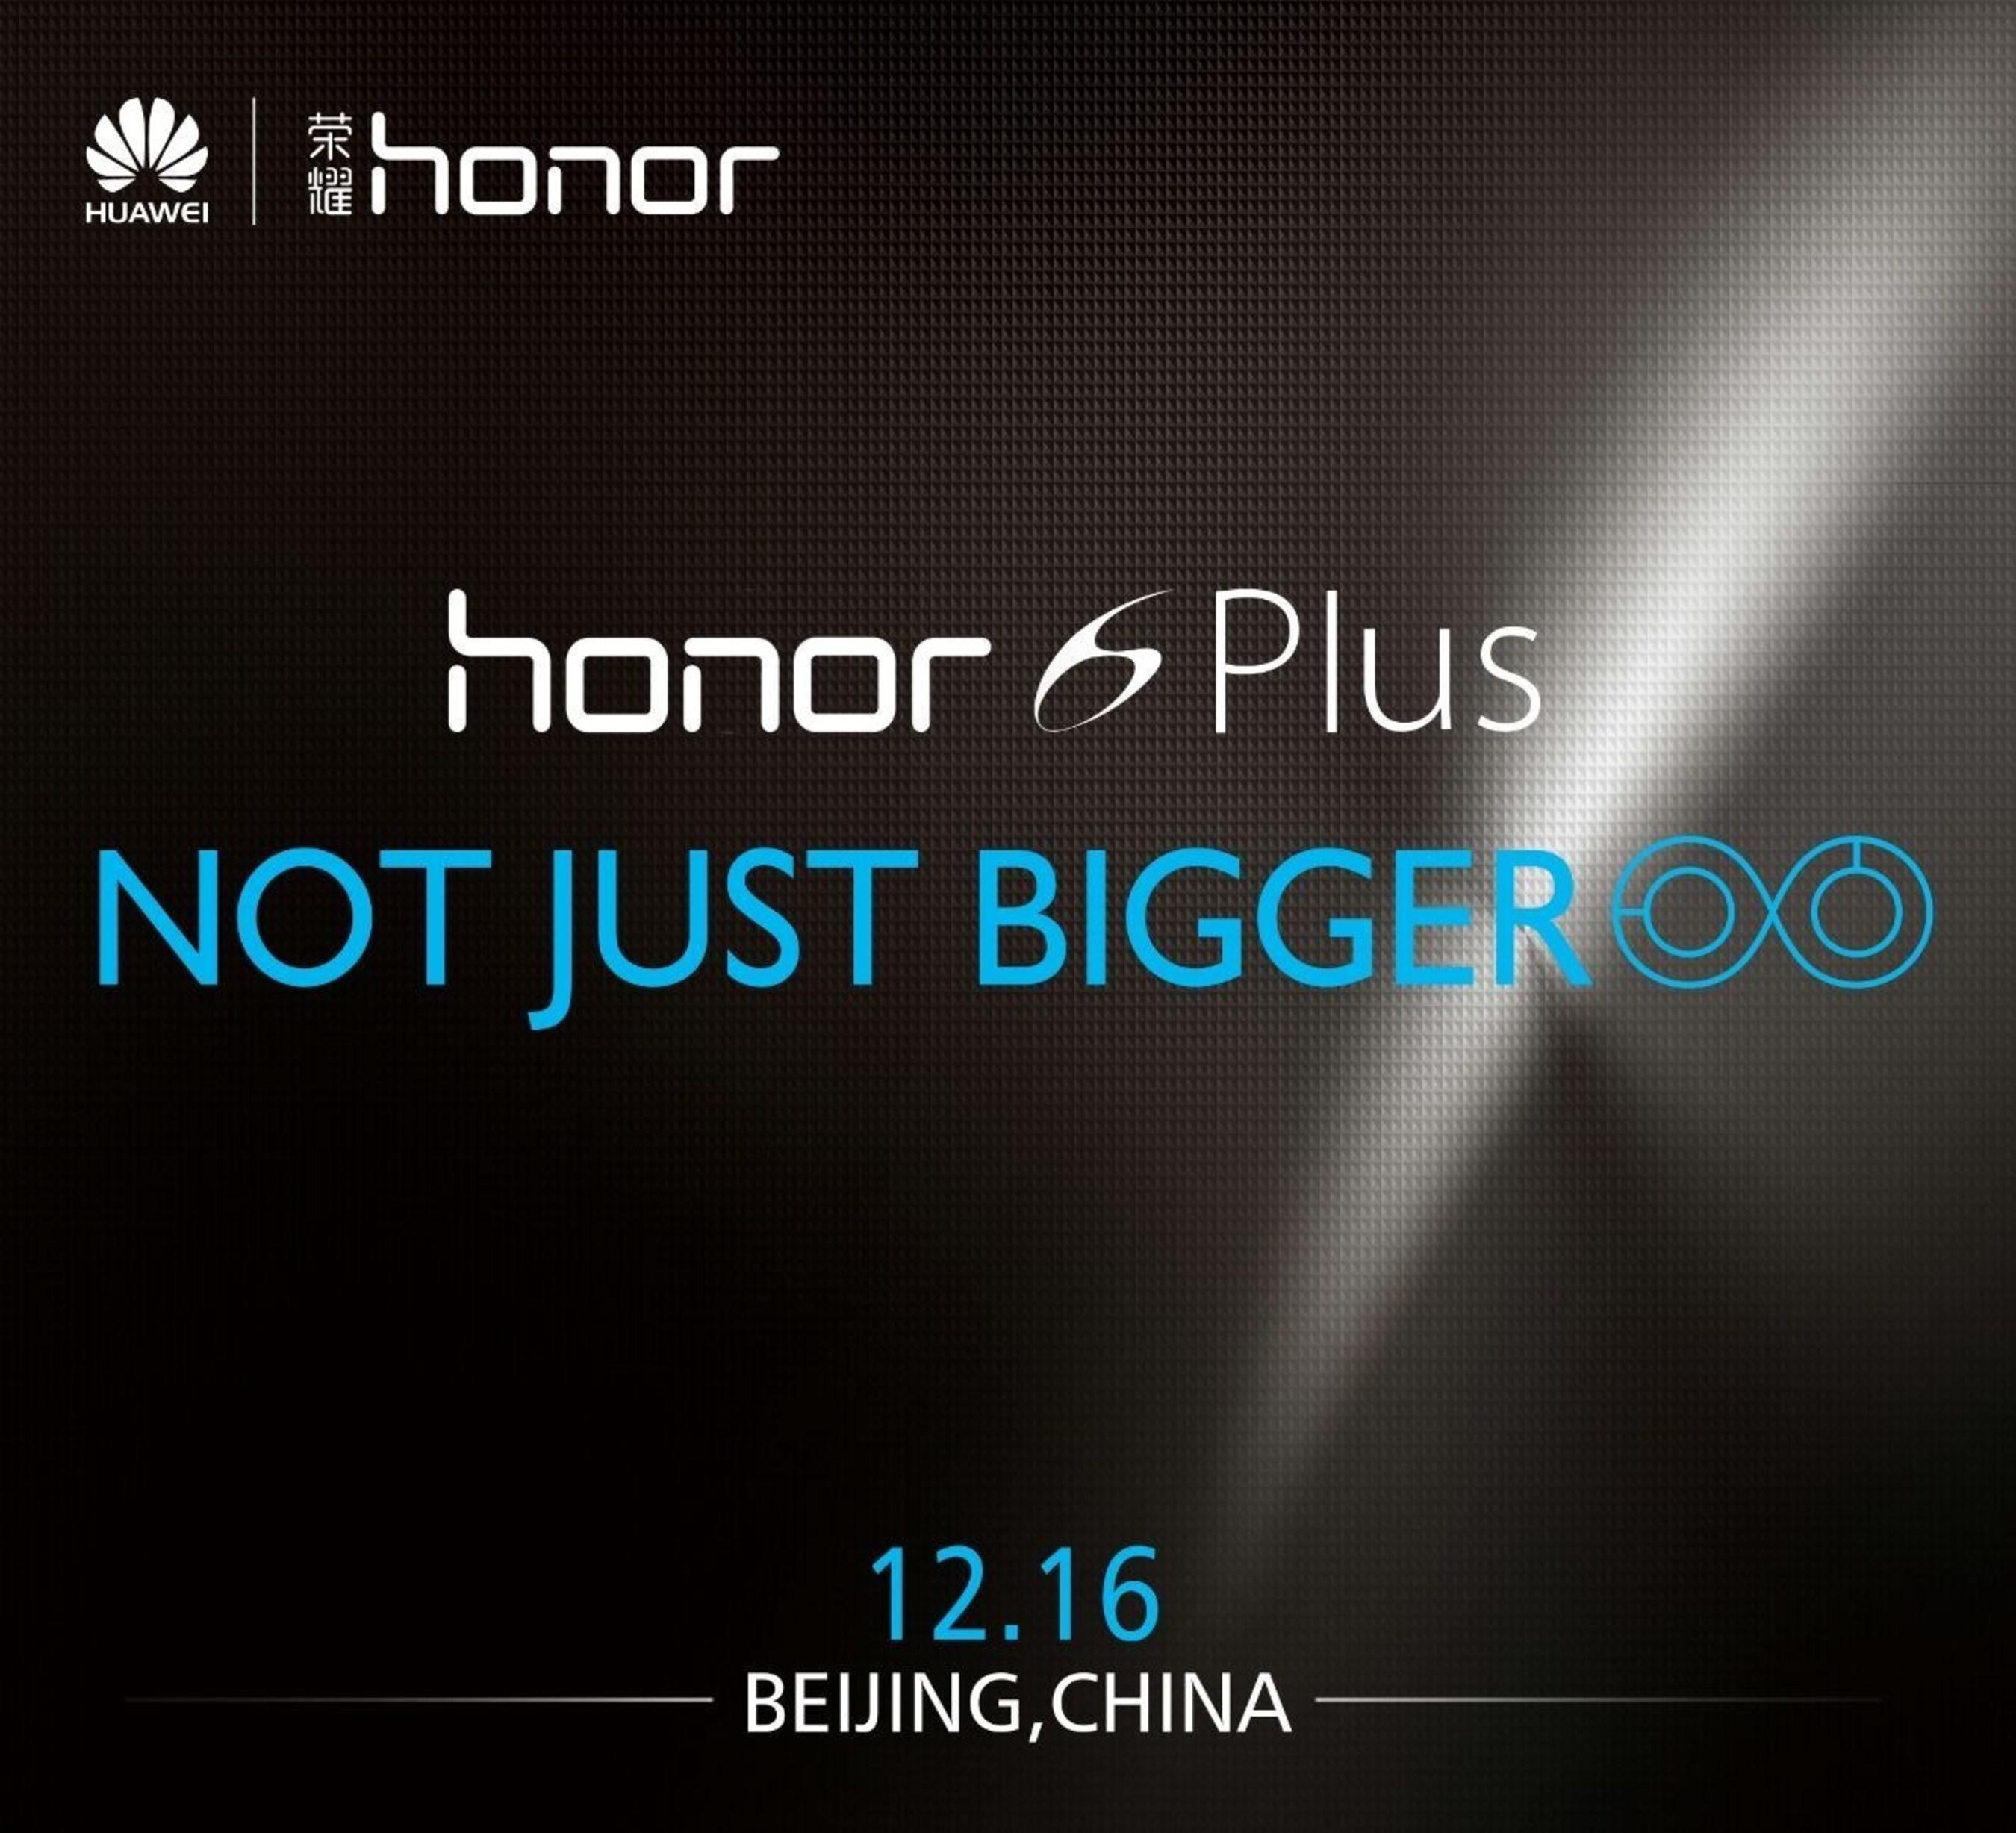 The slogan of Honor 6 Plus